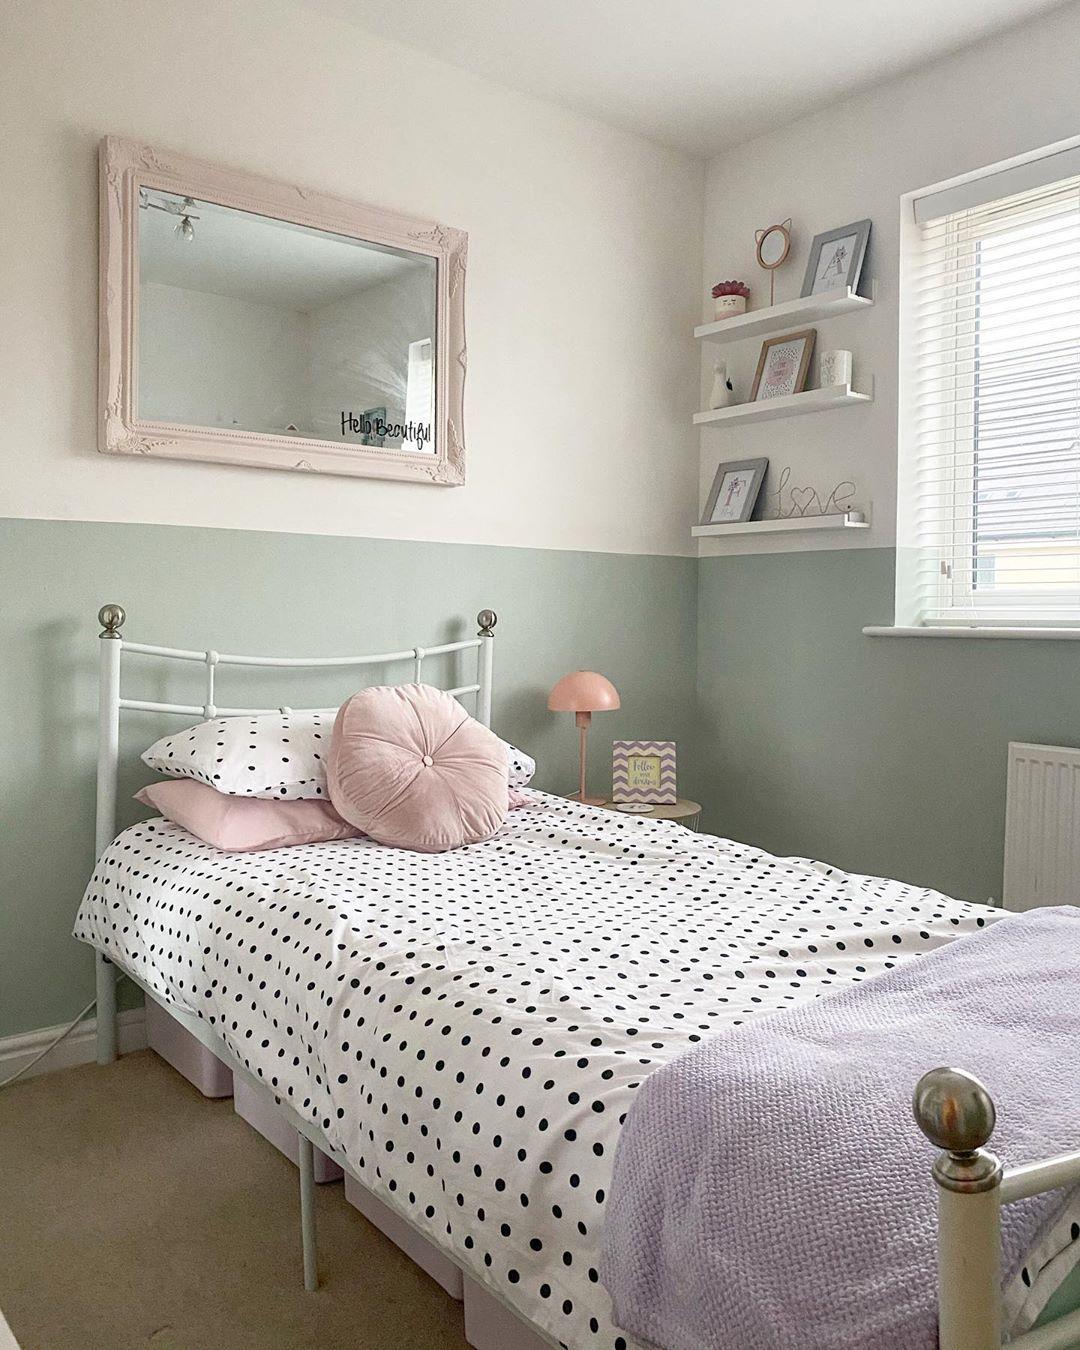 Abbie Lebo On Instagram New Room Reveal Halfpaintedwall Farrowandball Farrowandballtheresasgr In 2020 Rooms Reveal New Room Half Painted Walls